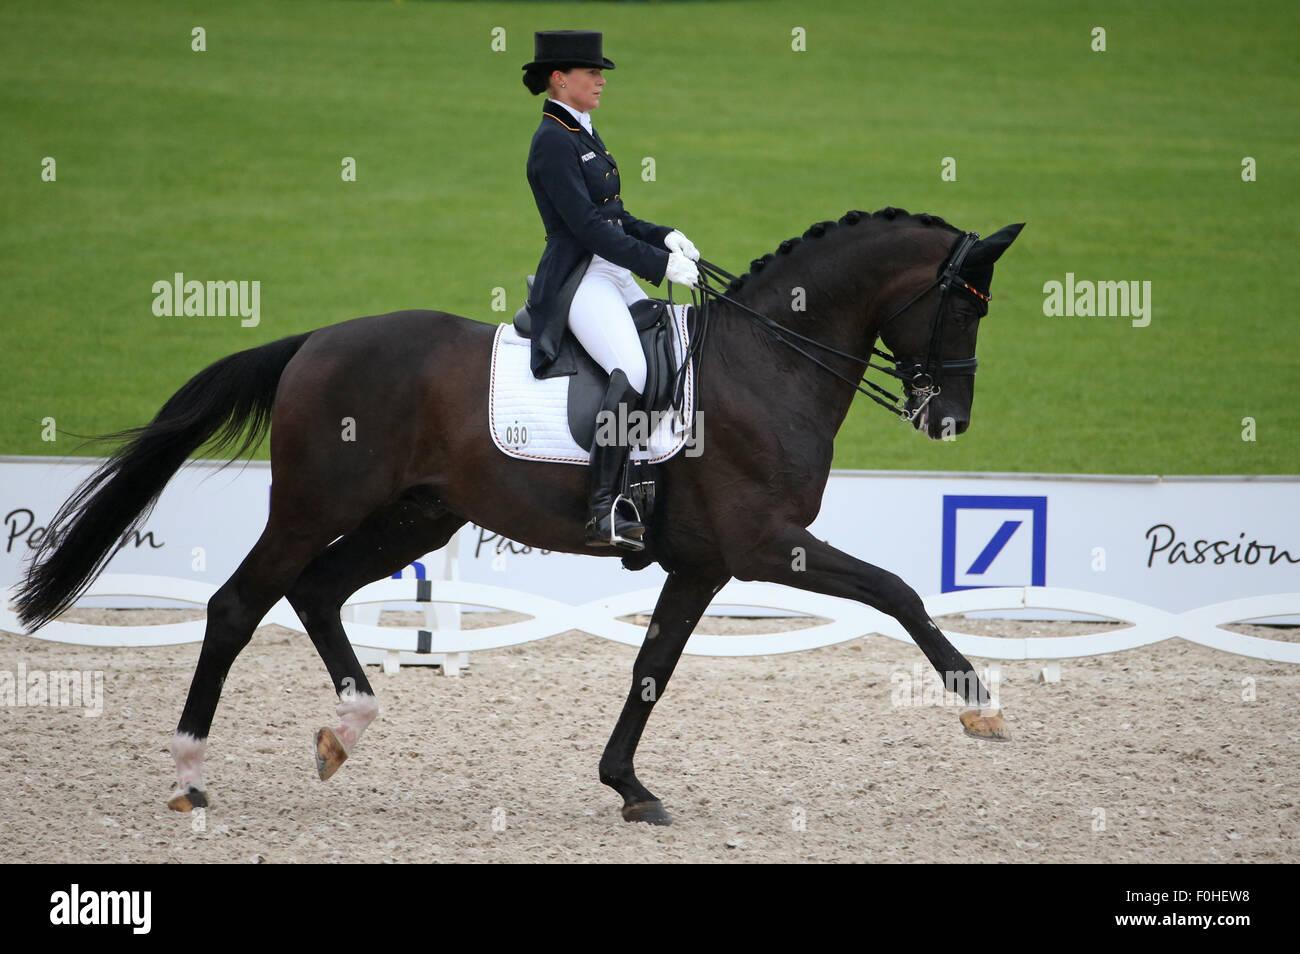 Kristina Broering Sprehe Of Germany Rides Her Horse Desperados In The Stock Photo Alamy